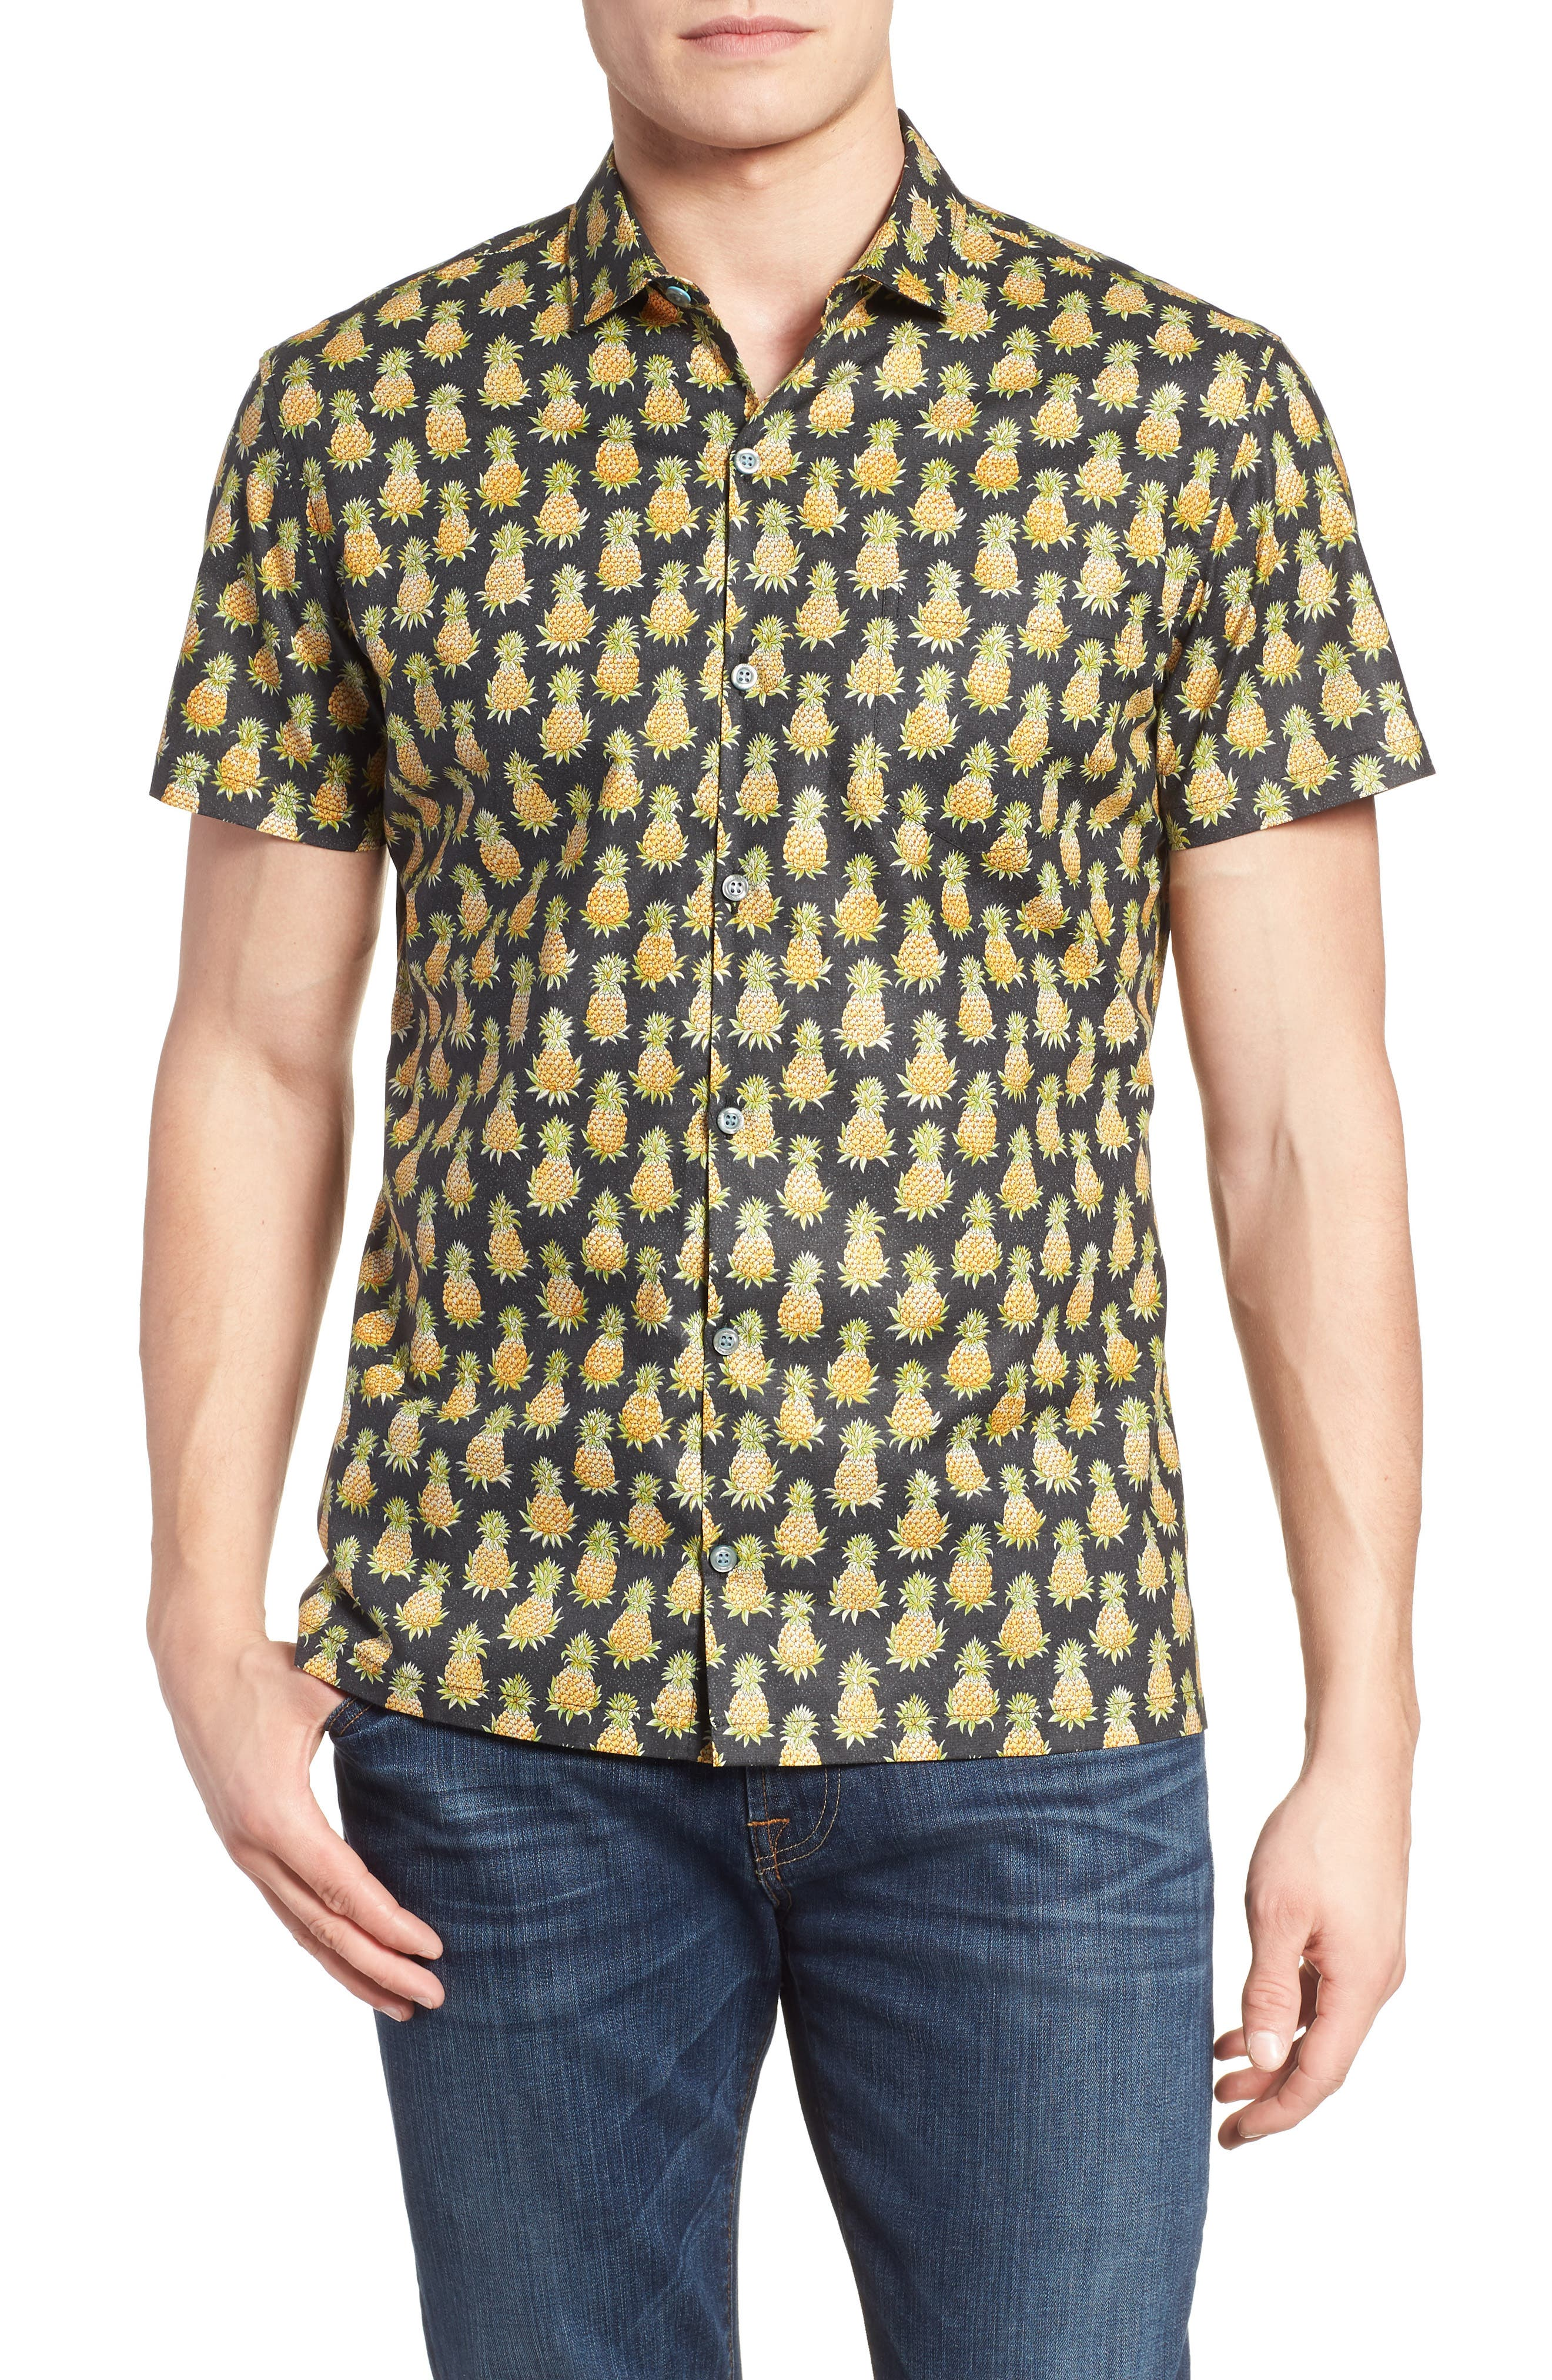 Pineaplism Trim Fit Camp Shirt,                         Main,                         color, BLACK